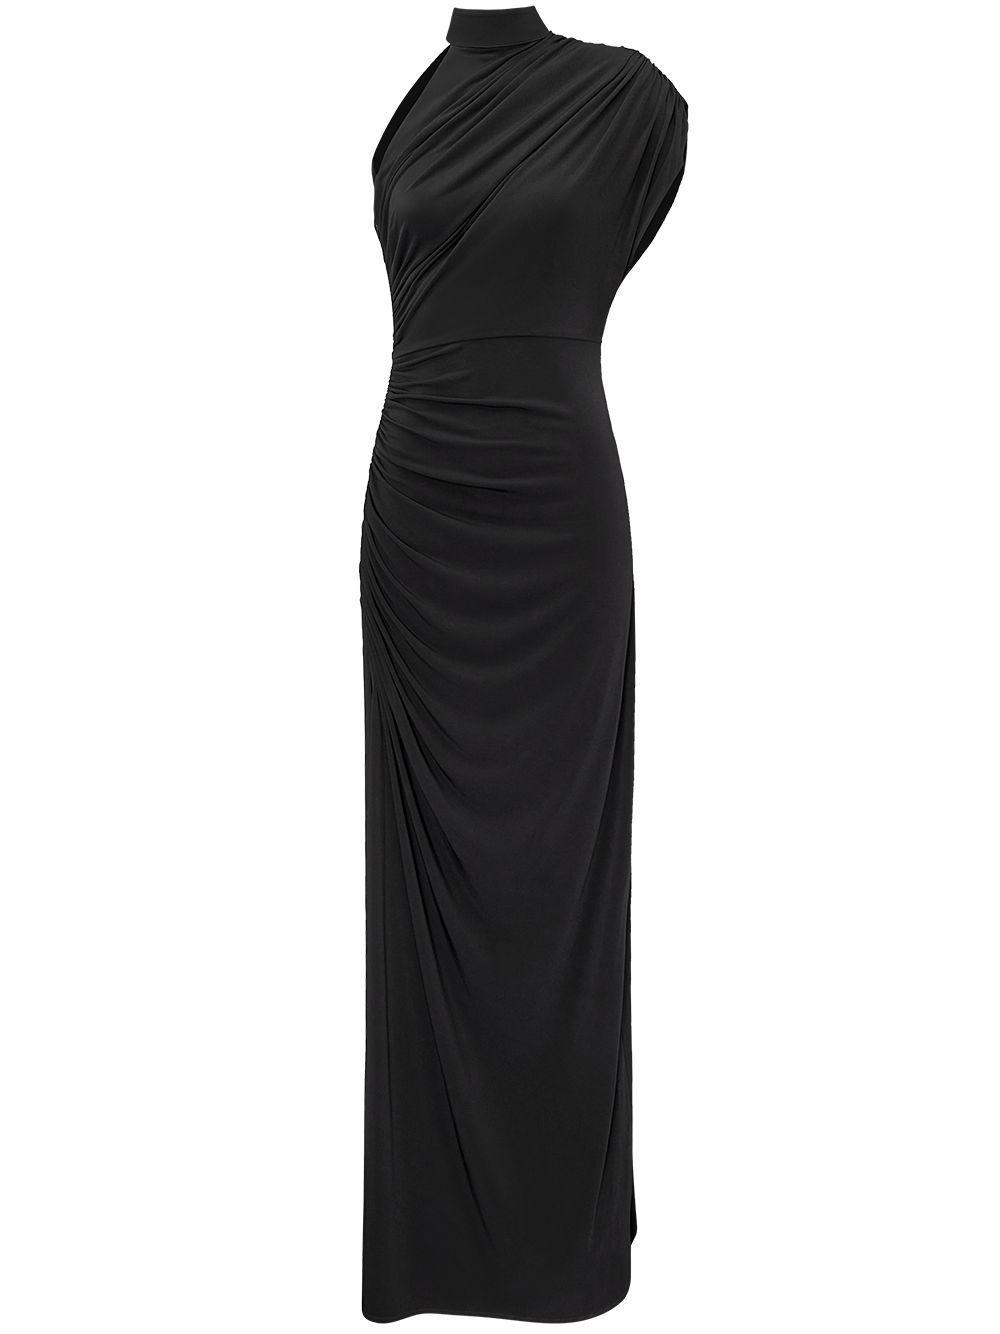 Dana One Shoulder Dress